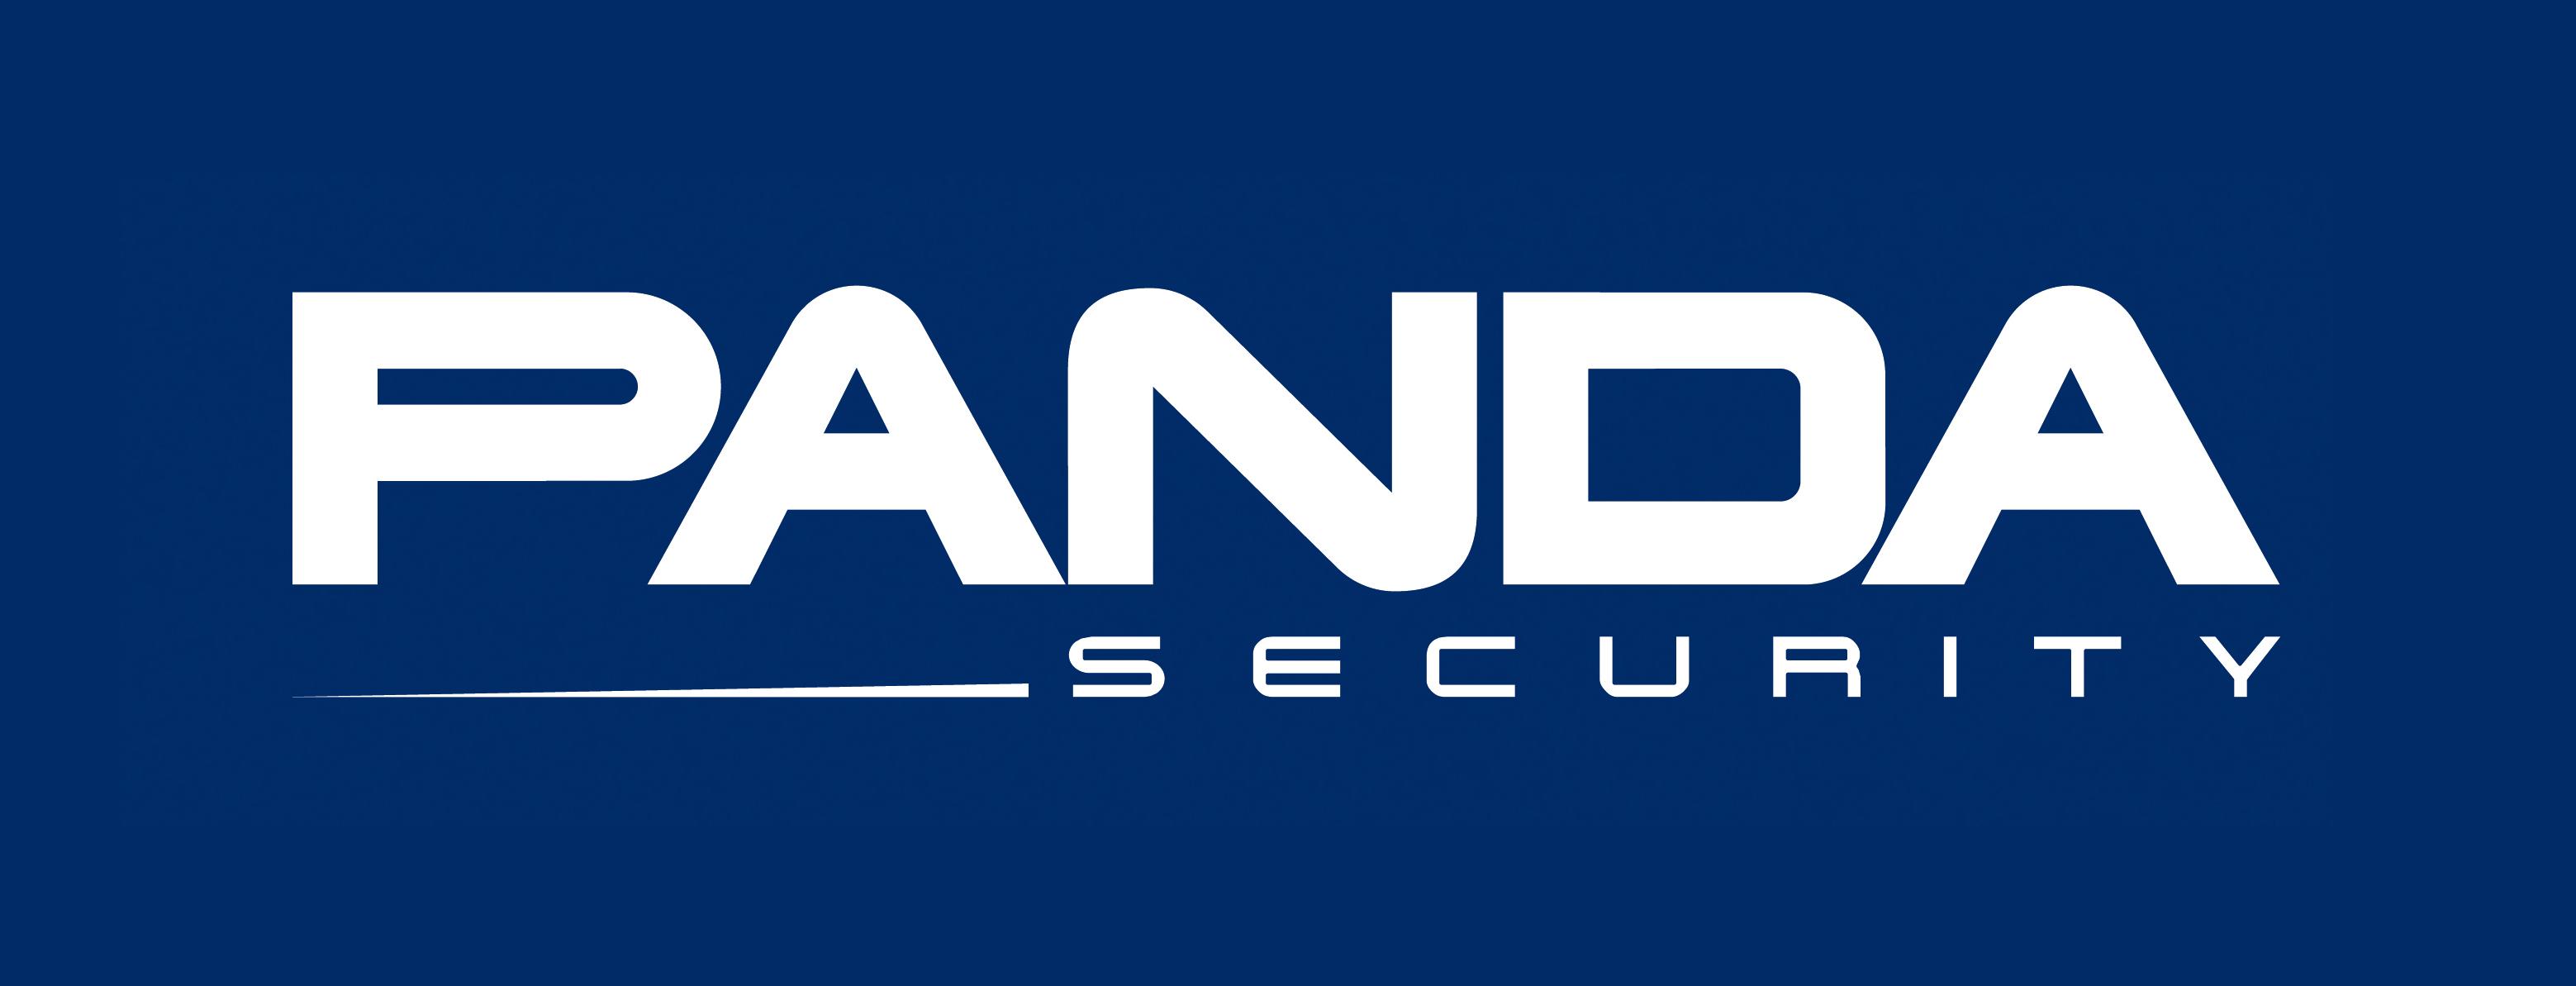 panda cloud antivirus pro espa ol versi n 3 0 1 full pc donde oscar. Black Bedroom Furniture Sets. Home Design Ideas